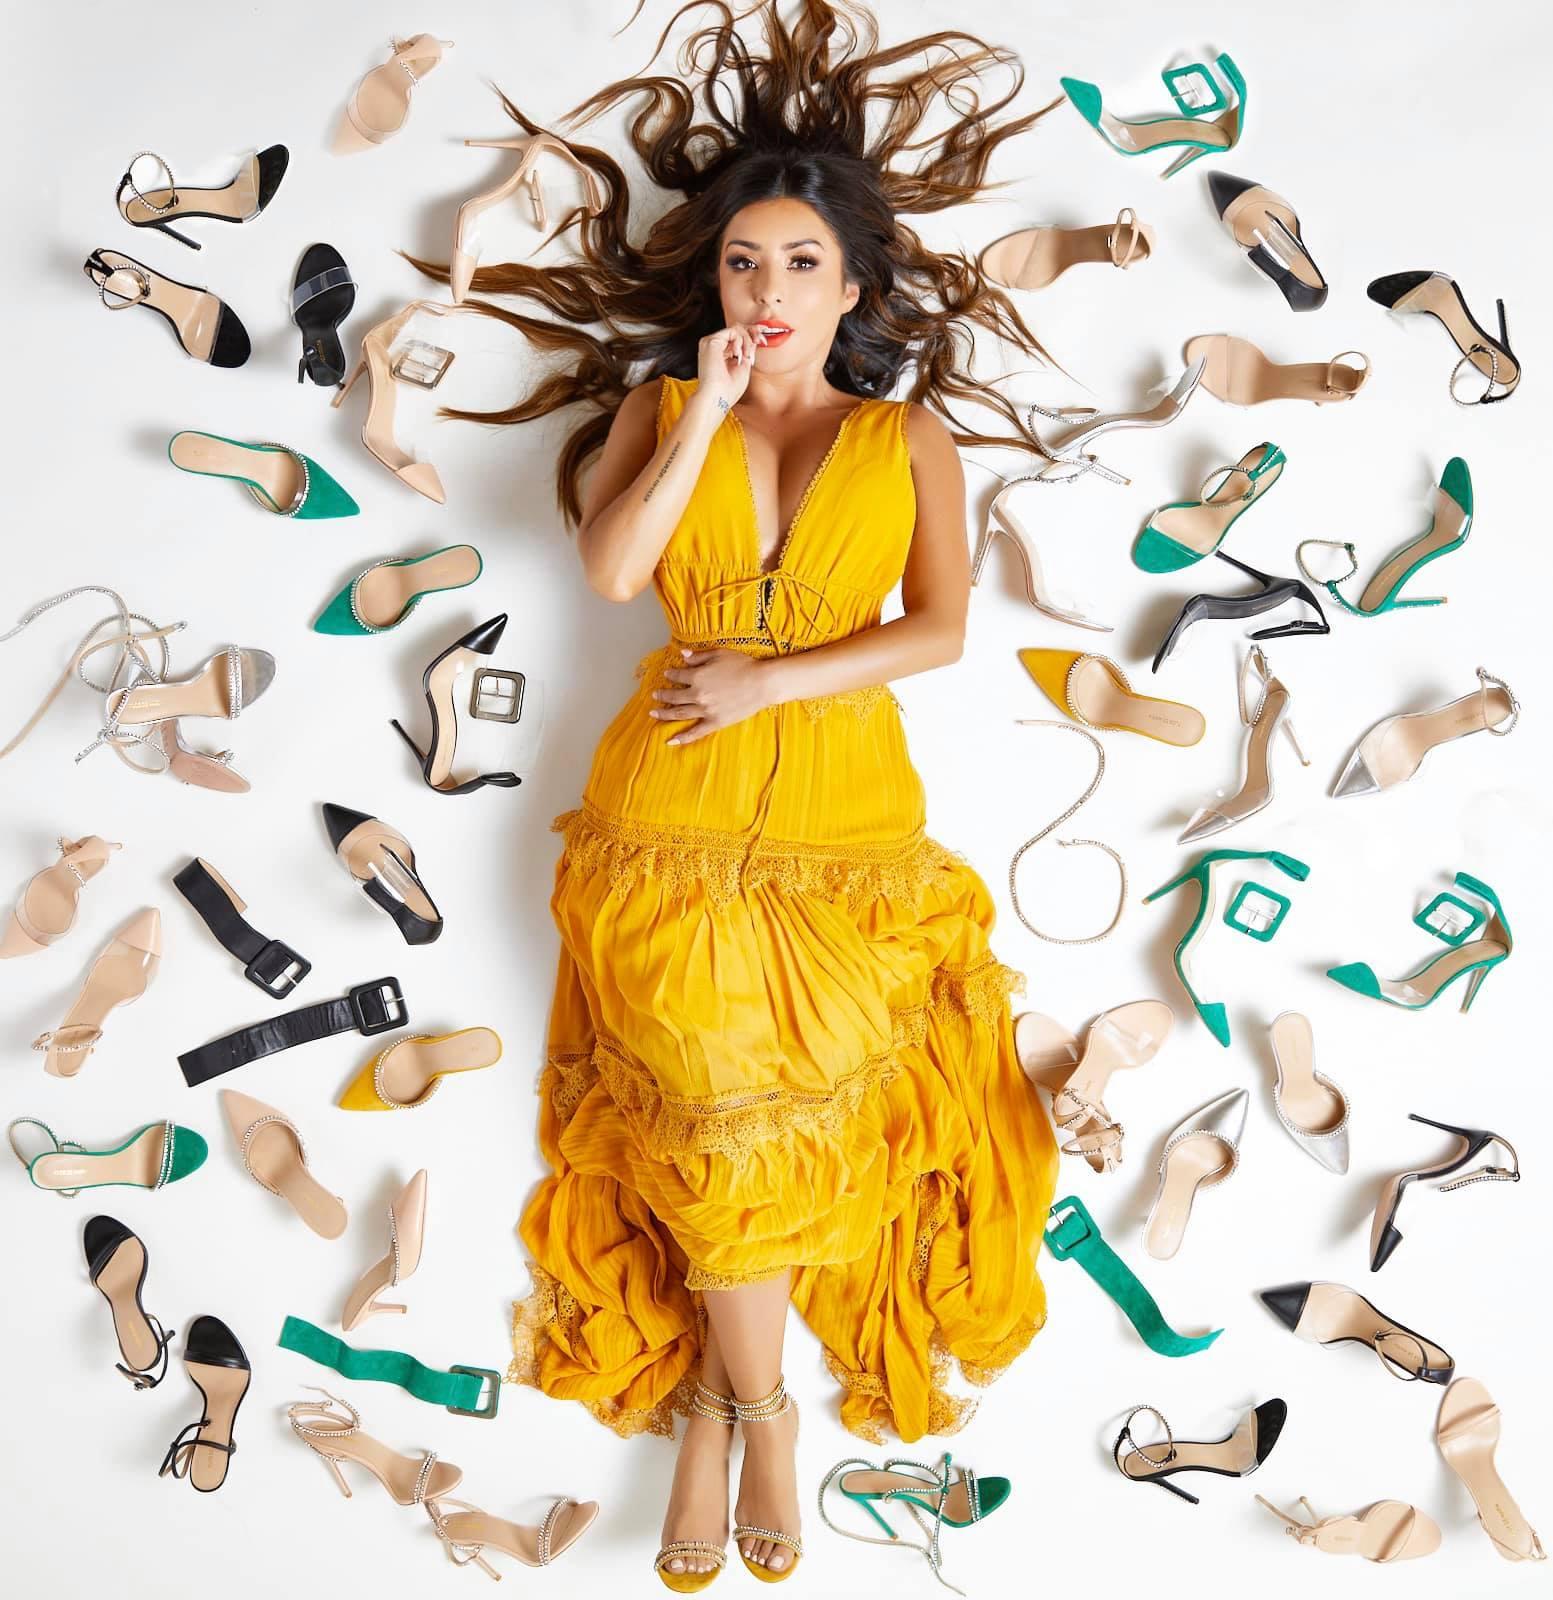 Flor de Maria Rivera – Fashion designer, blogger, and seller